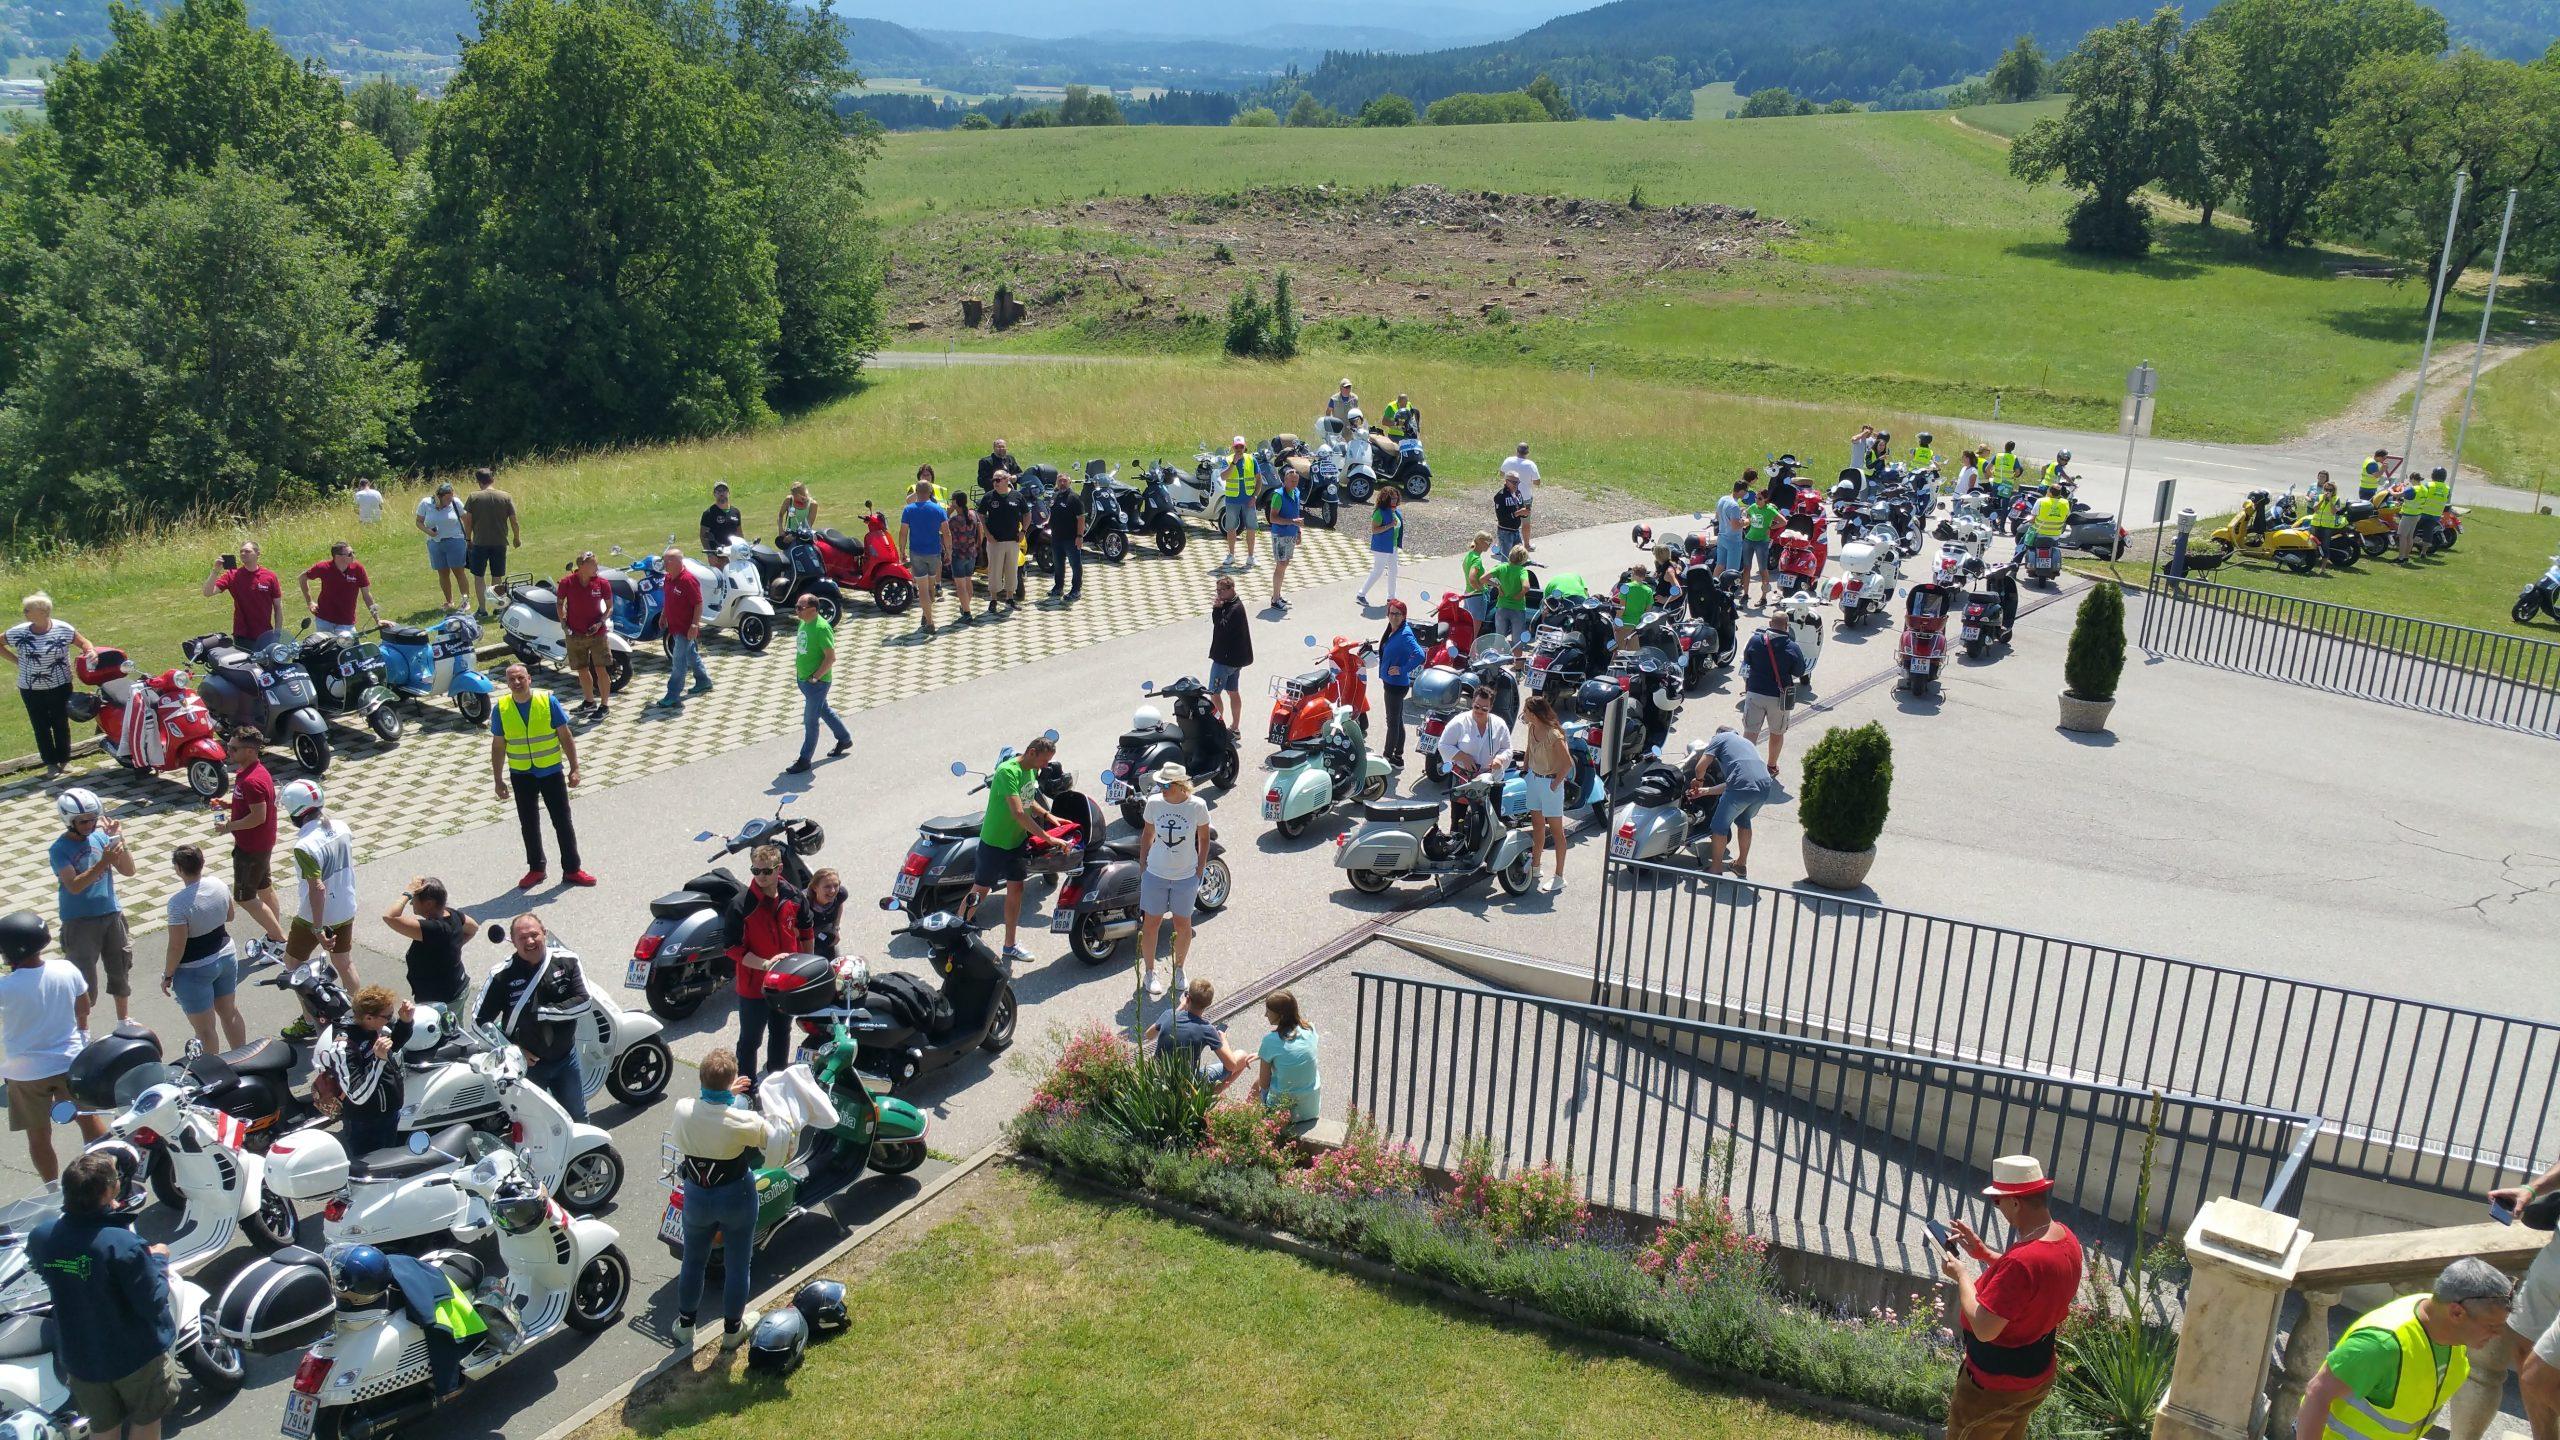 Vespa Club Hagen Zell am See 2019